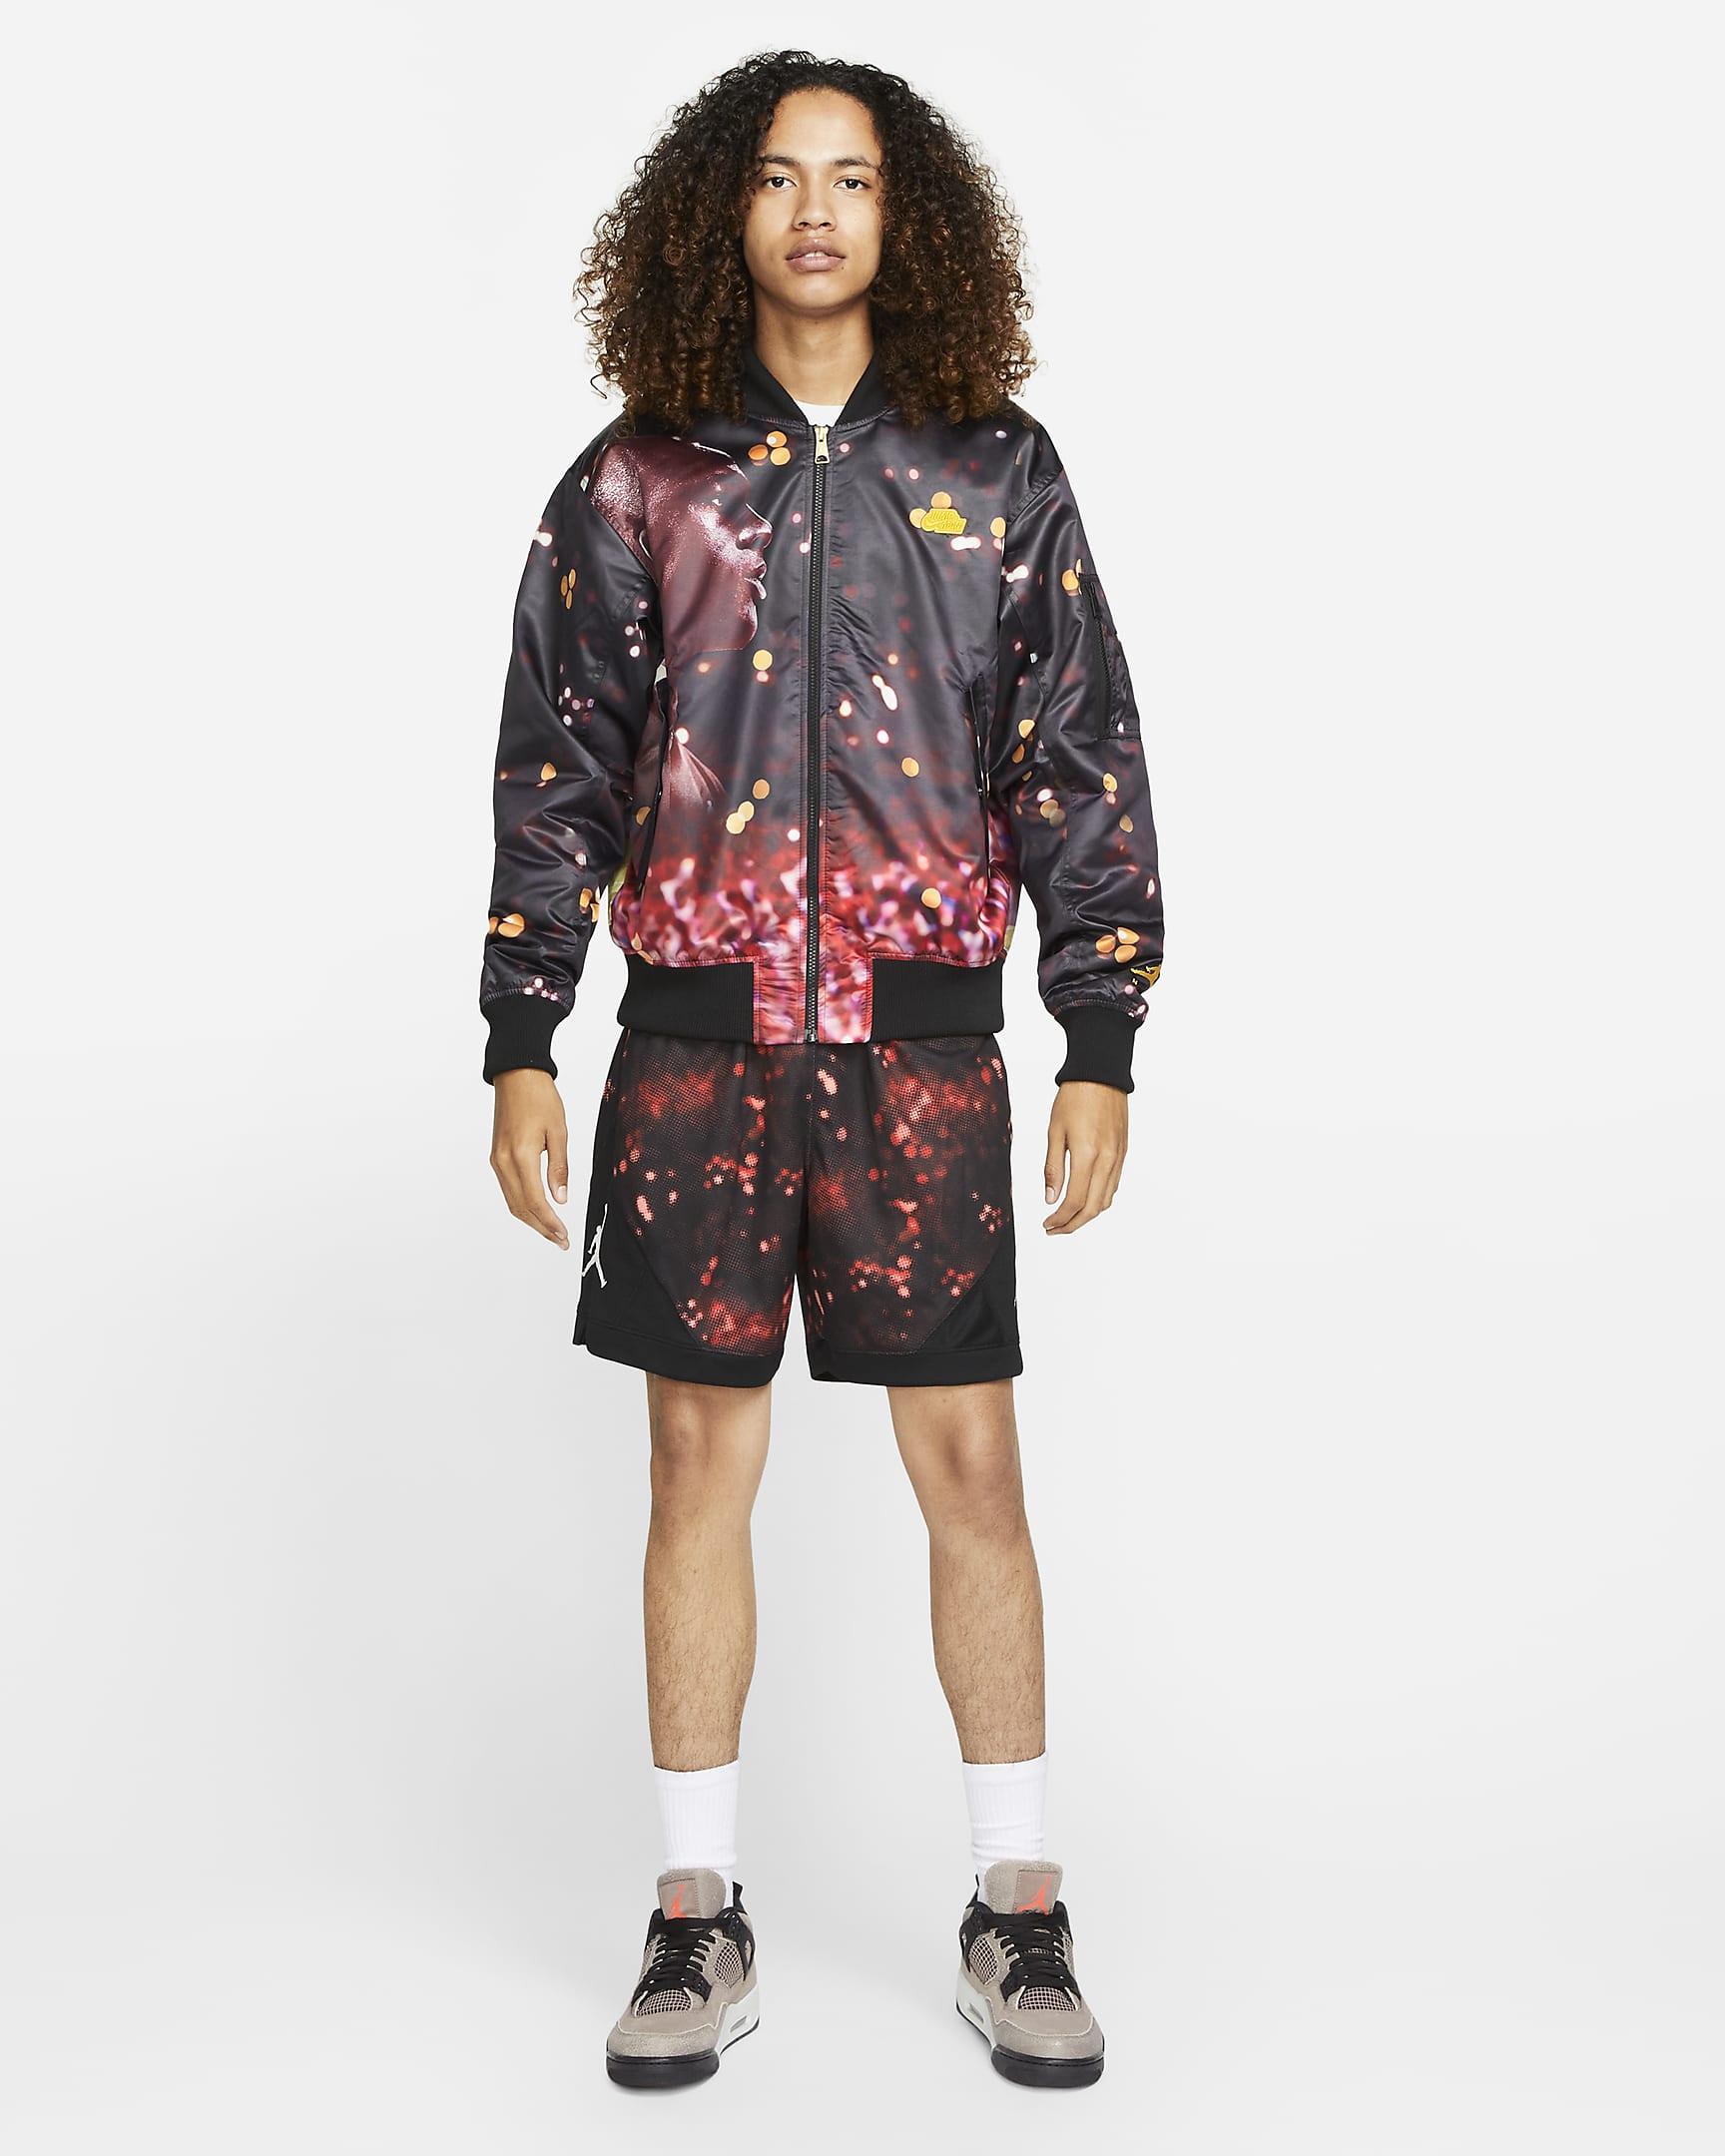 jordan-jumpman-mens-ma-1-jacket-m9cfk1-5.png